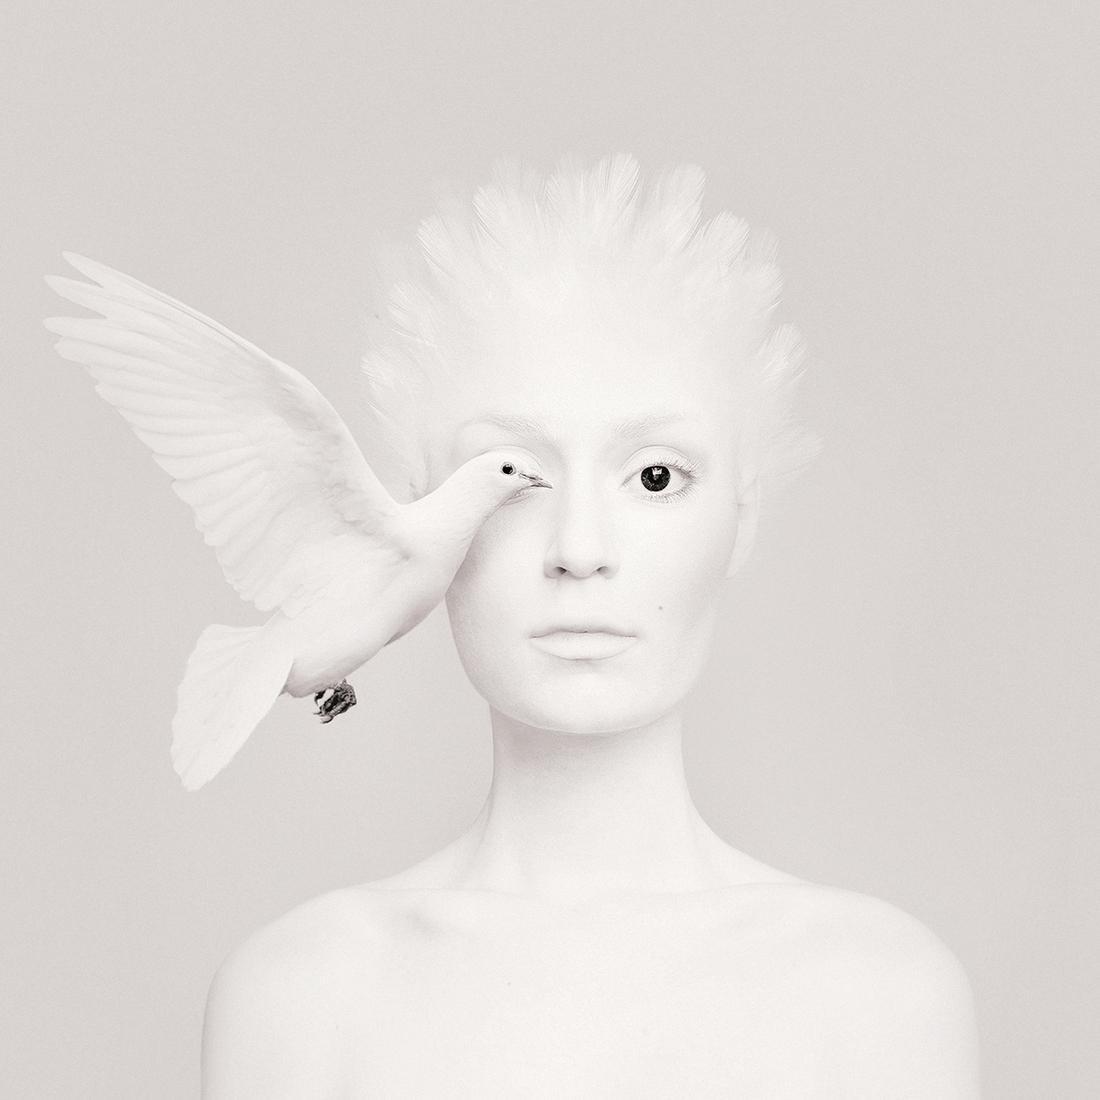 03-White-Dove-Flora-Borsi-Animeyed-Self-Portraits-Surreal-Photographs-www-designstack-co